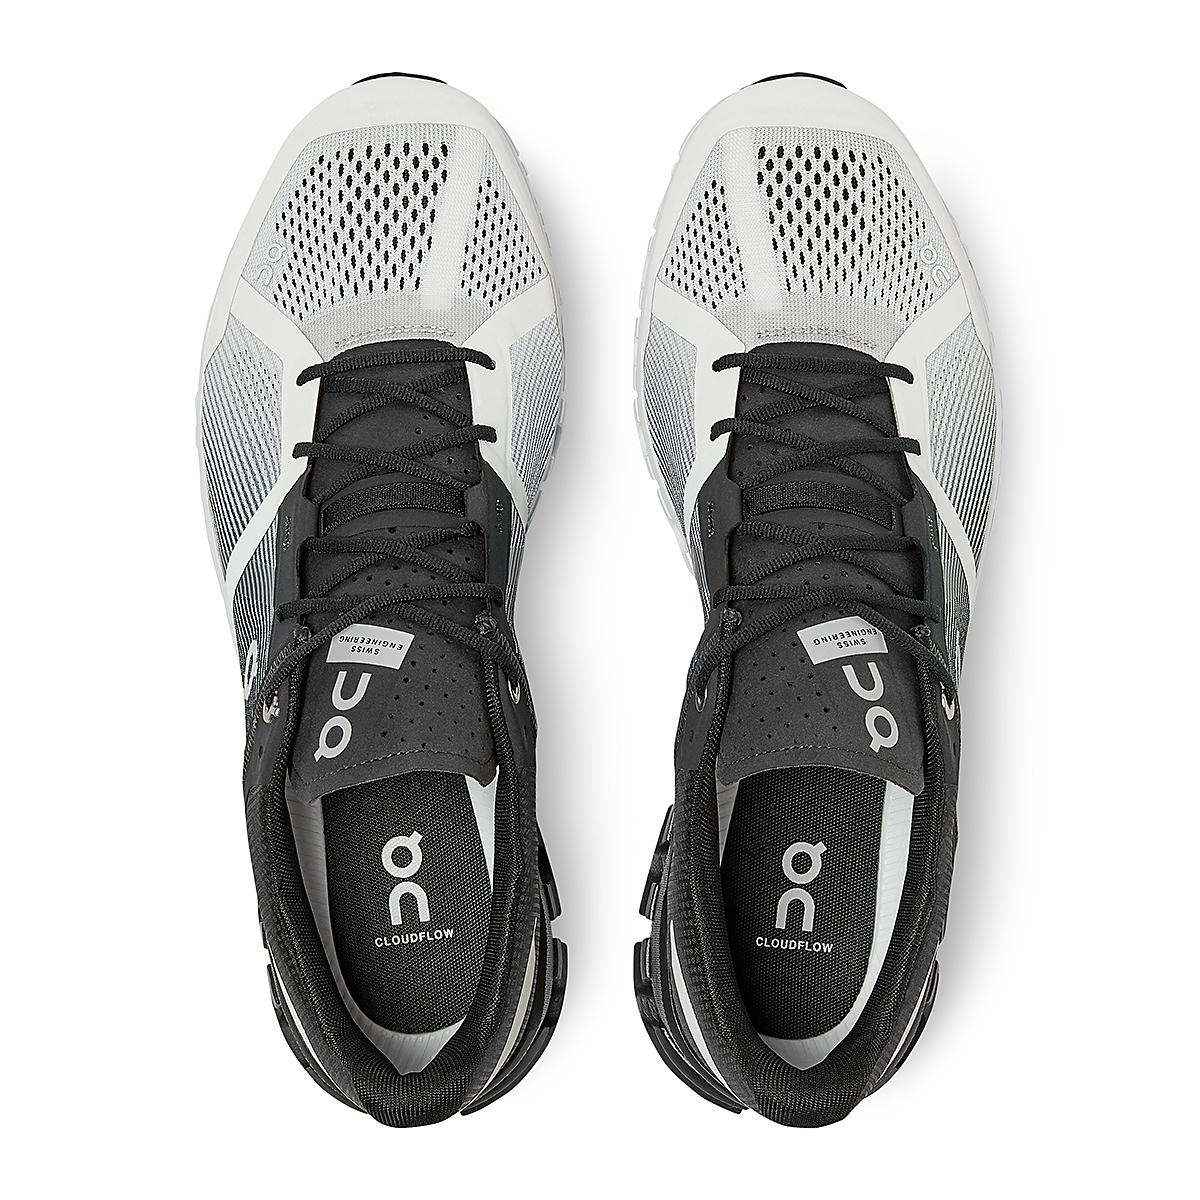 Men's On Cloudflow 2.0 Running Shoe - Color: Black/White - Size: 9.5 - Width: Regular, Black/White, large, image 3